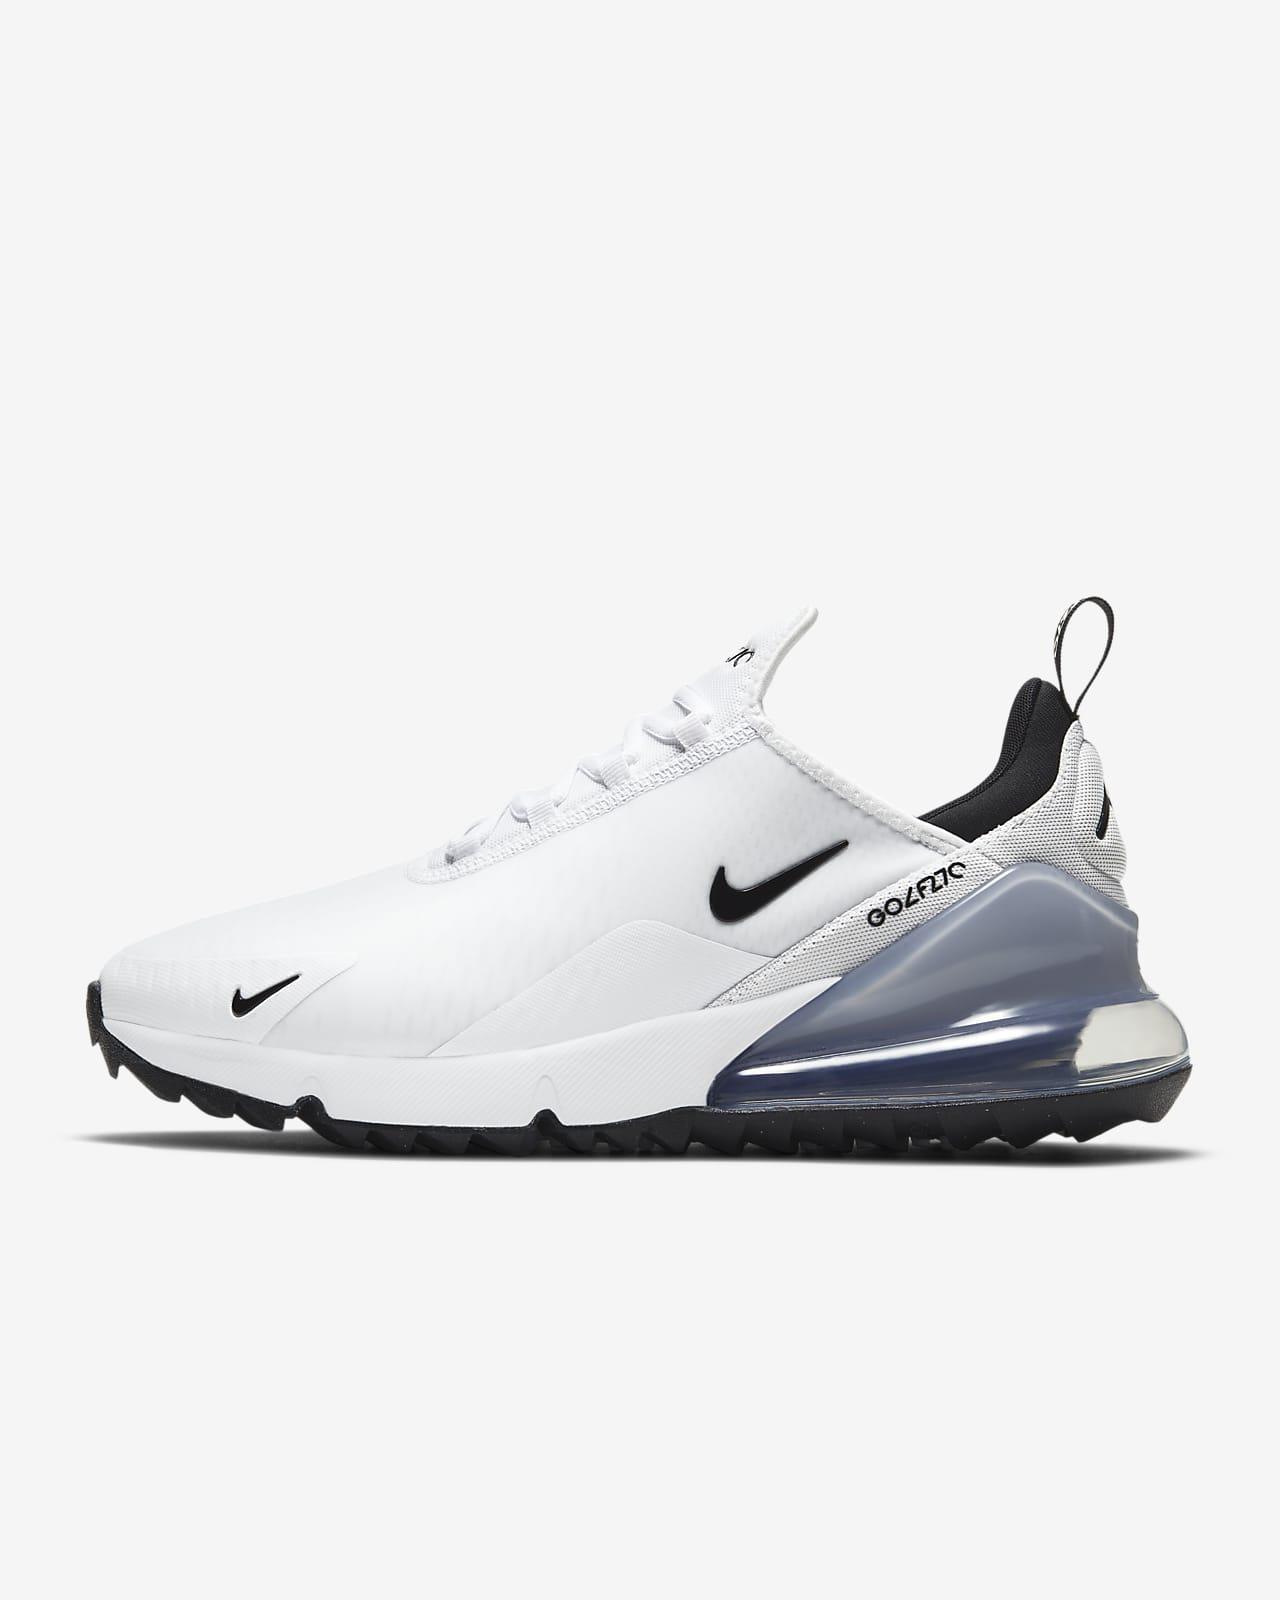 Calzado de golf Nike Air Max 270 G